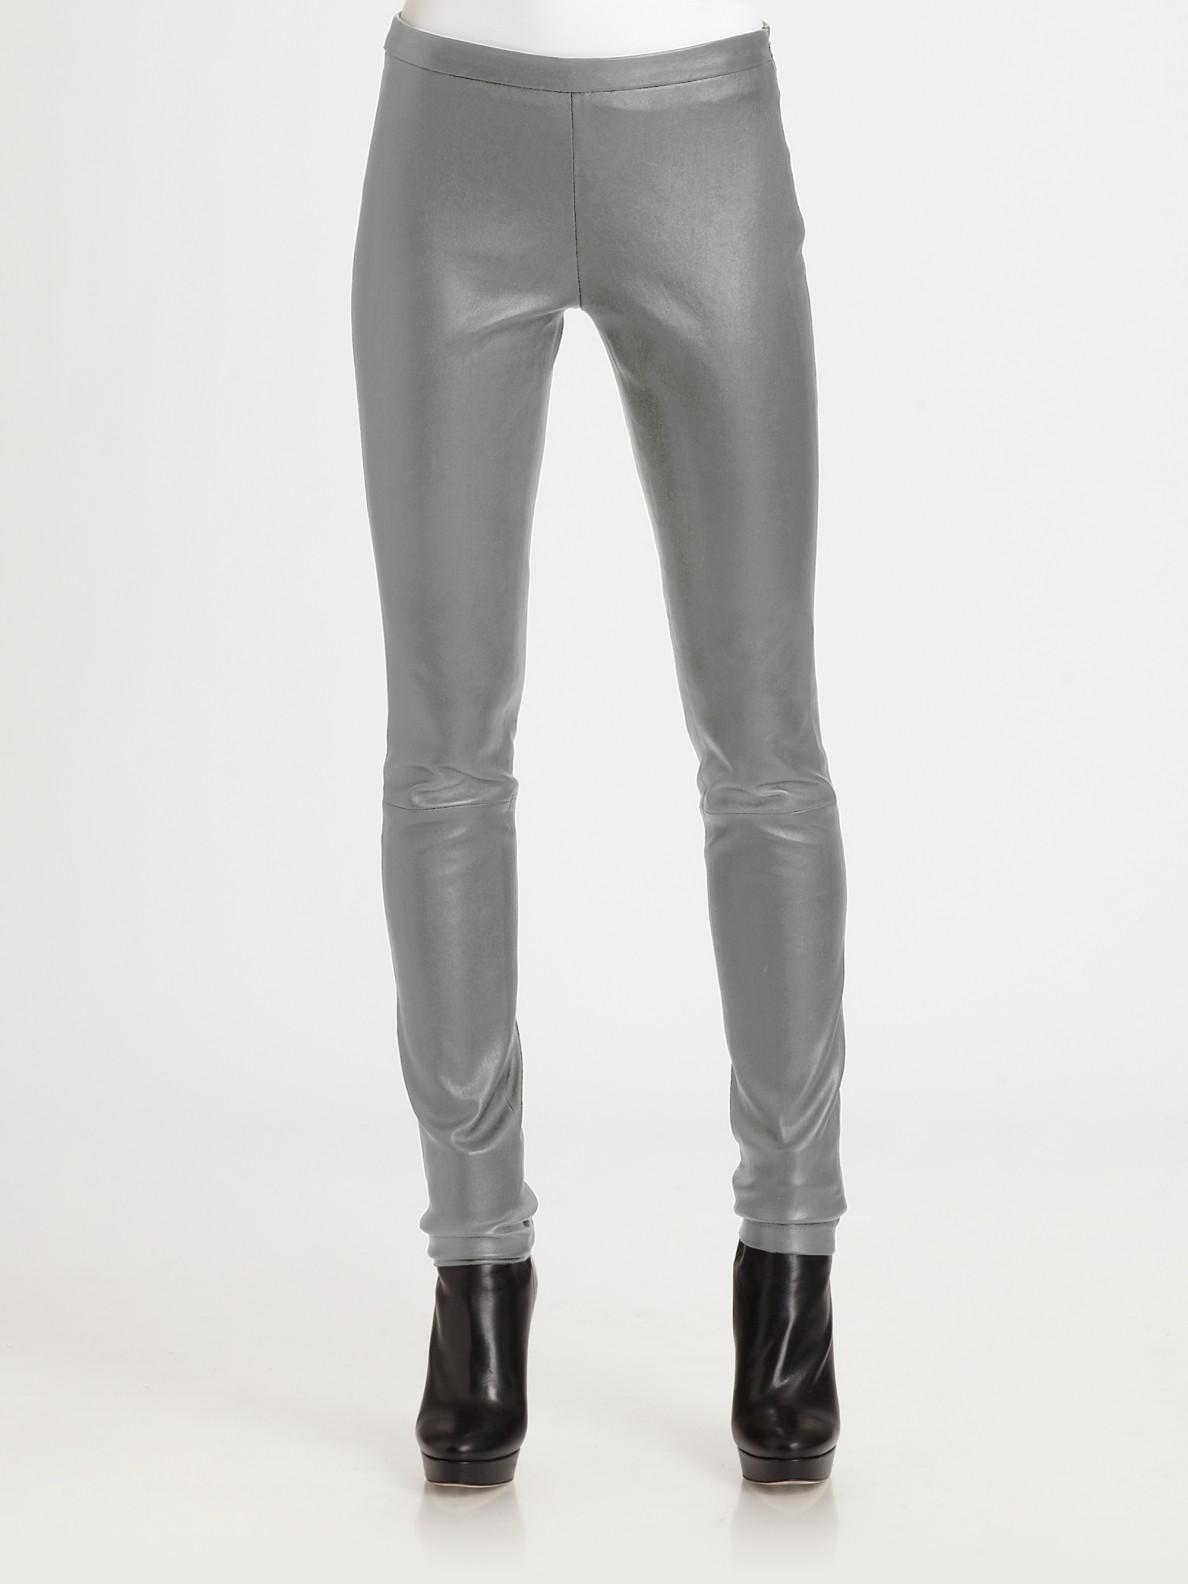 Grey Skinny Jeans For Women